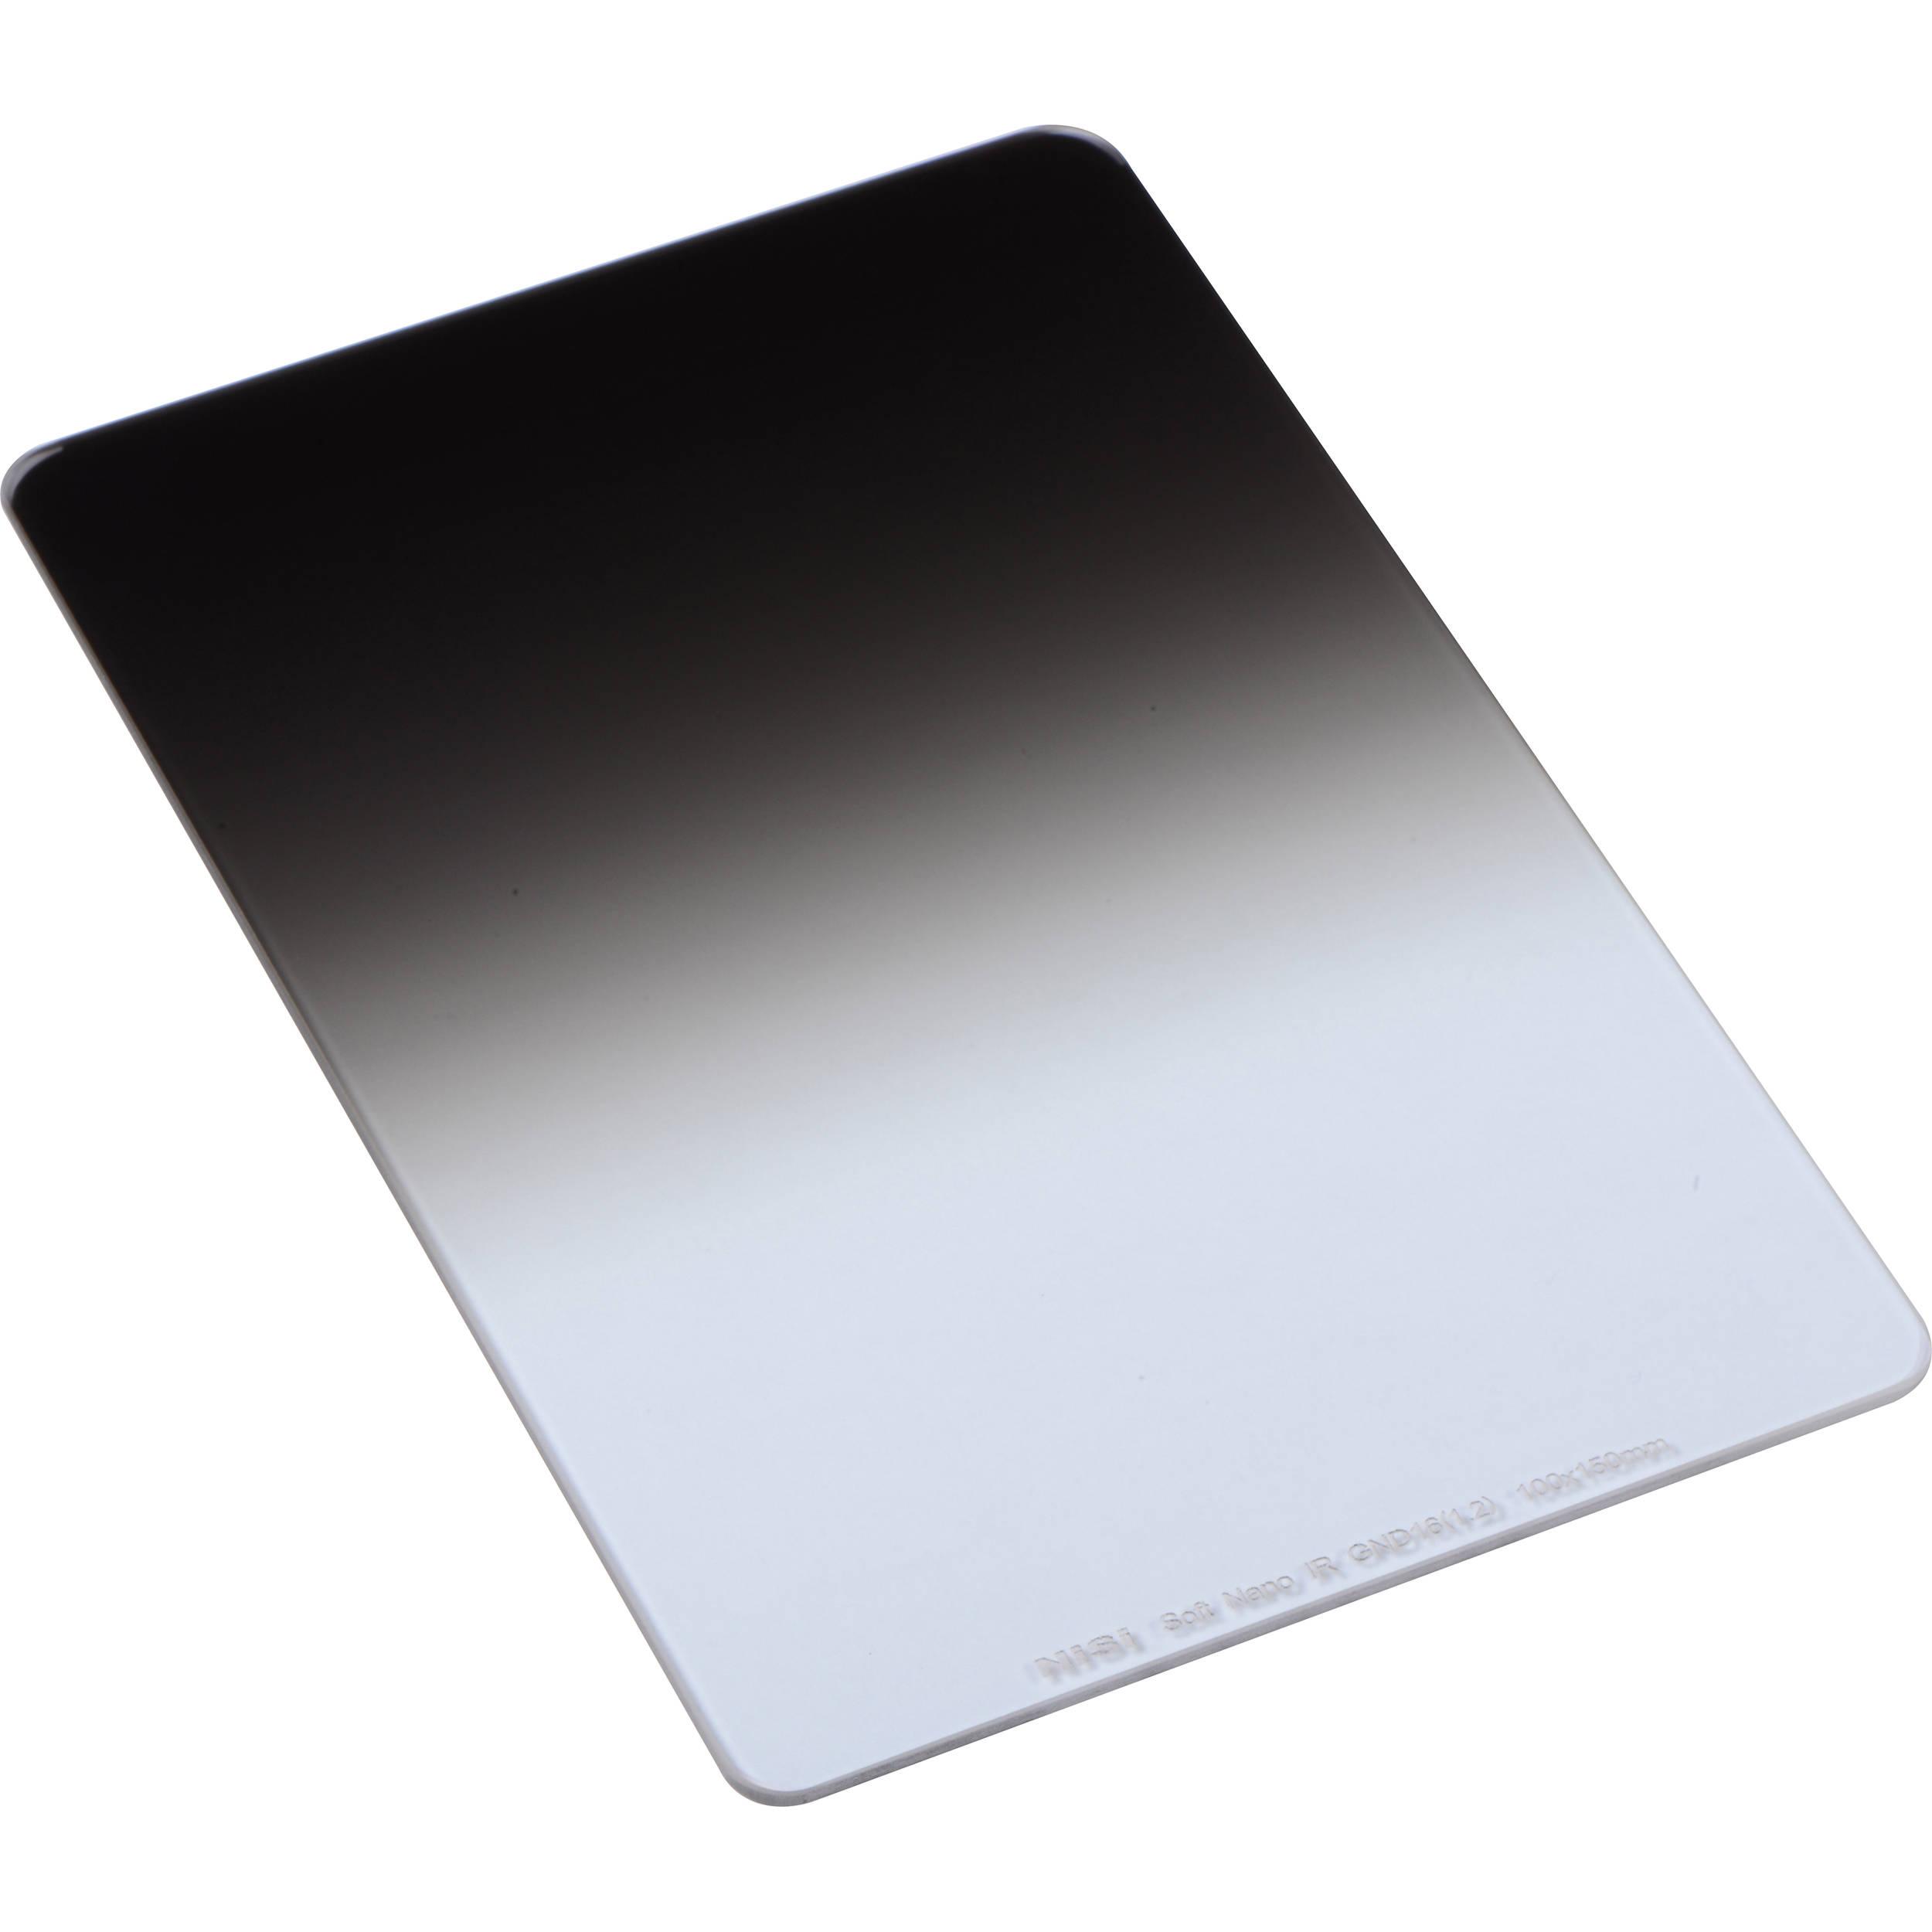 Black Soft IR GND Ikan Soft Graduated Neutral Density Lens Filter 1.2 100x150 16 NiSi